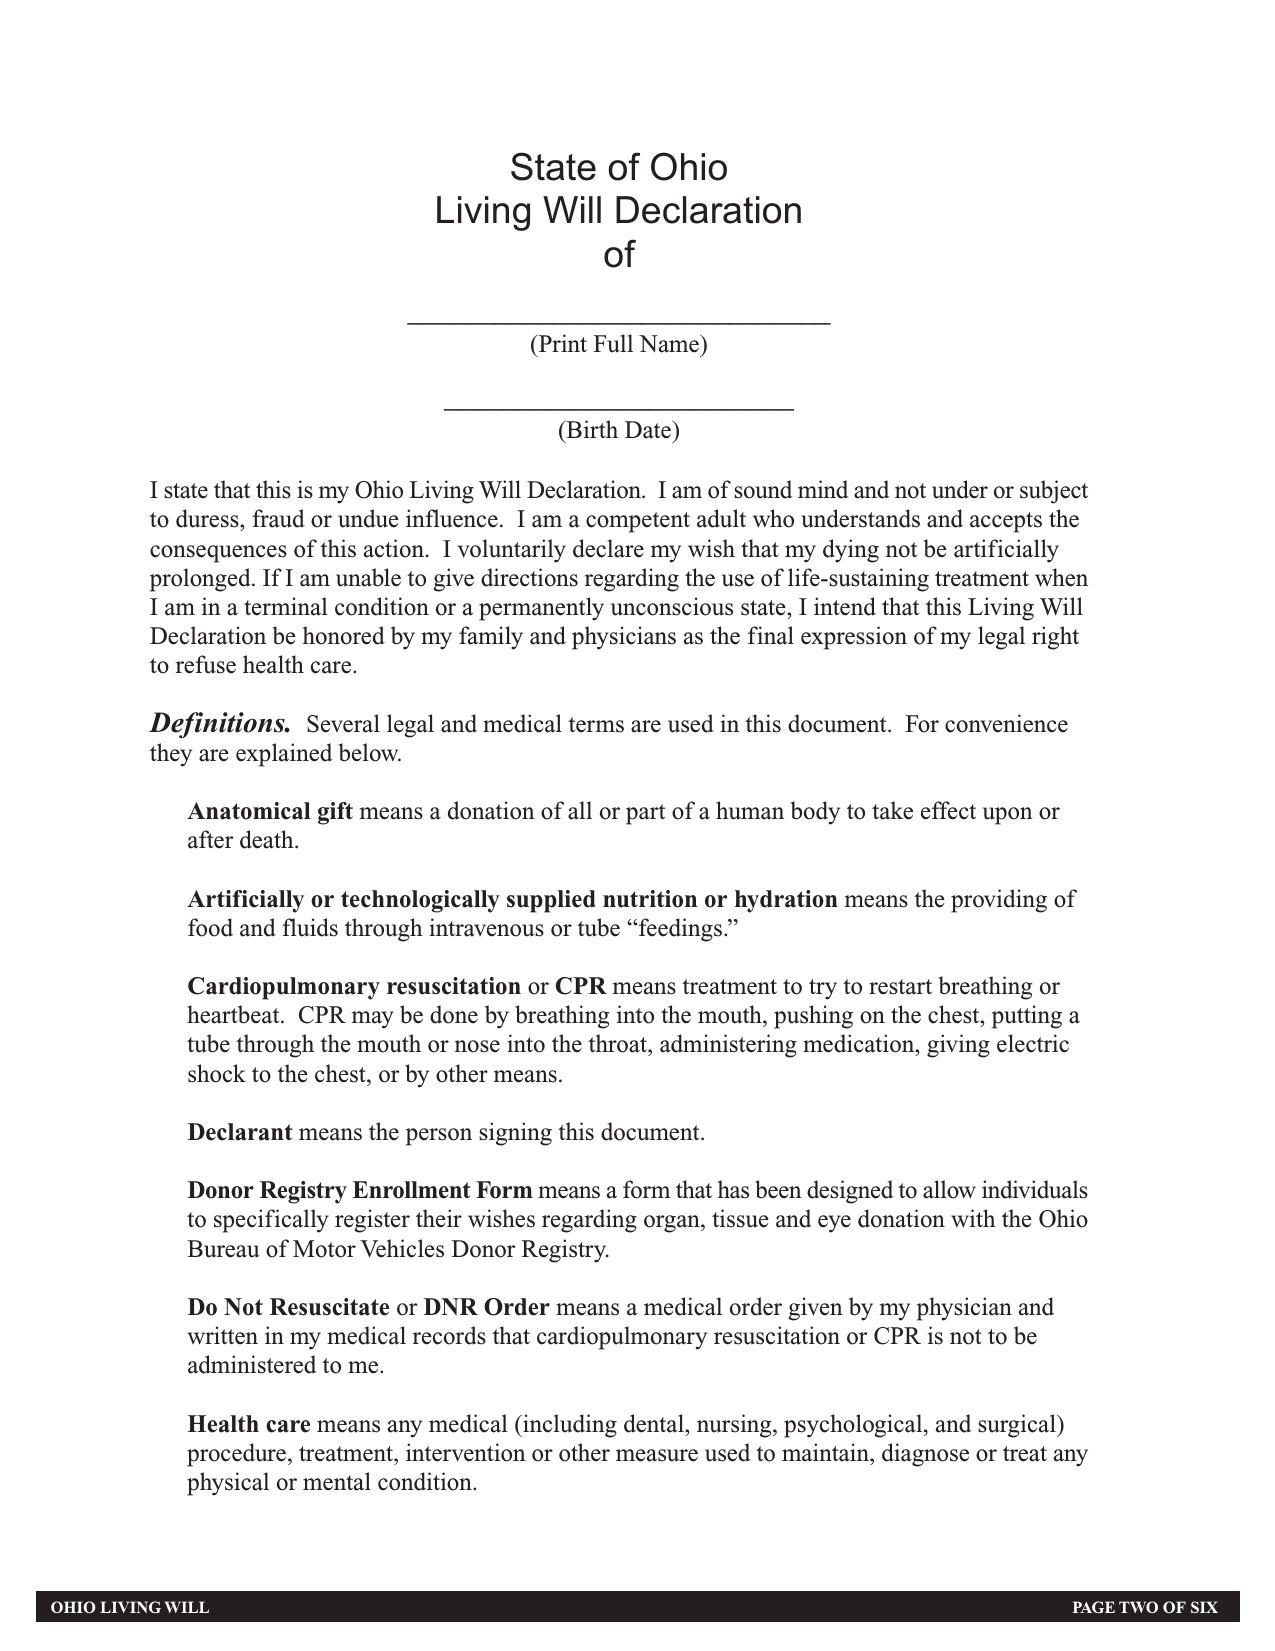 Download Ohio Living Will Form Advance Directive PDF